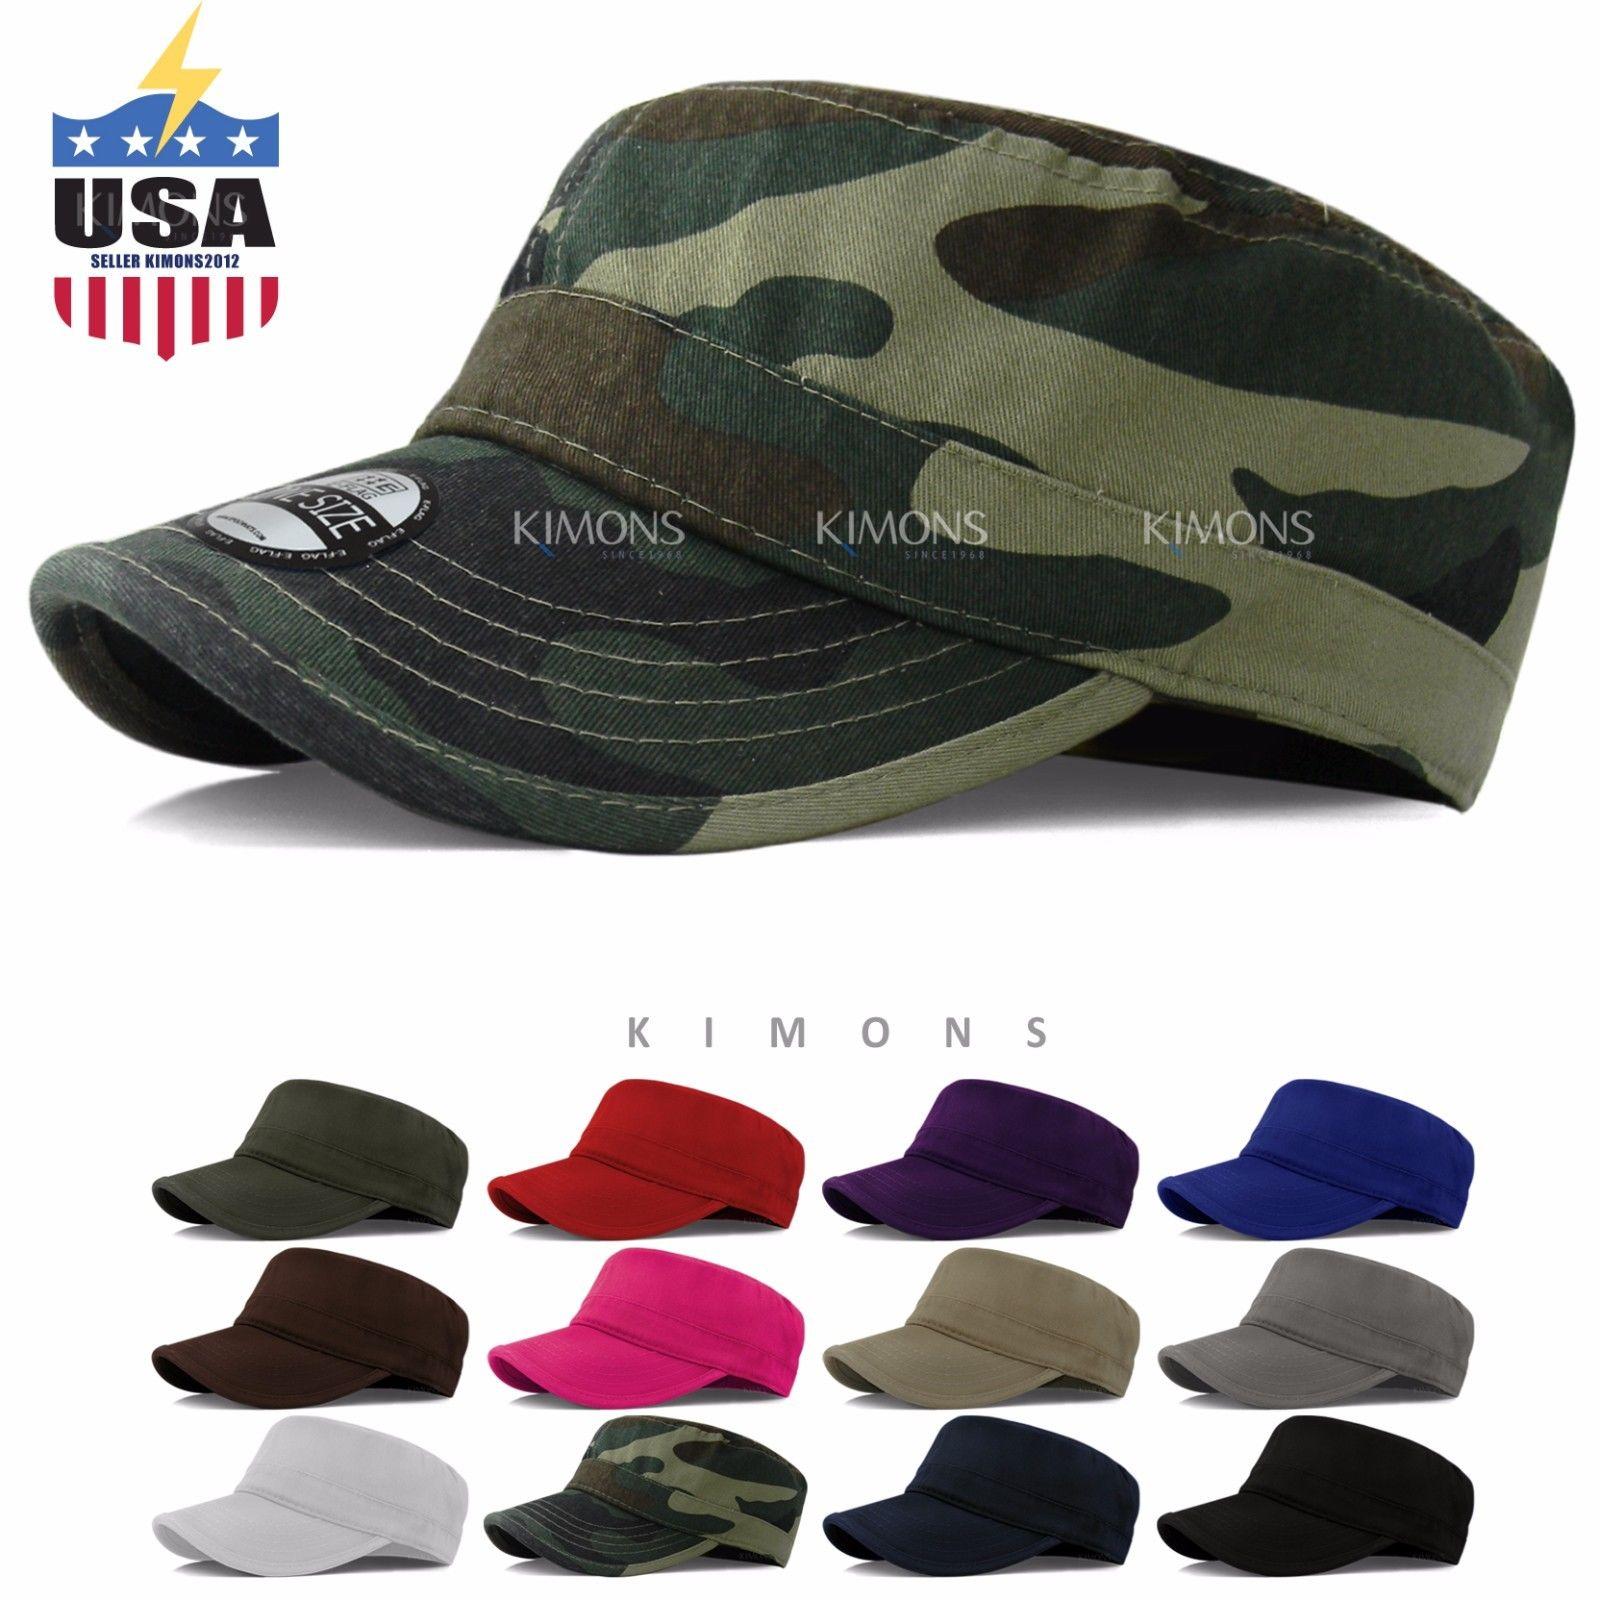 bb77ecea4b1eb Army Cadet Military Patrol Castro Cap Hat Men Women Golf Driving Summer  Baseball